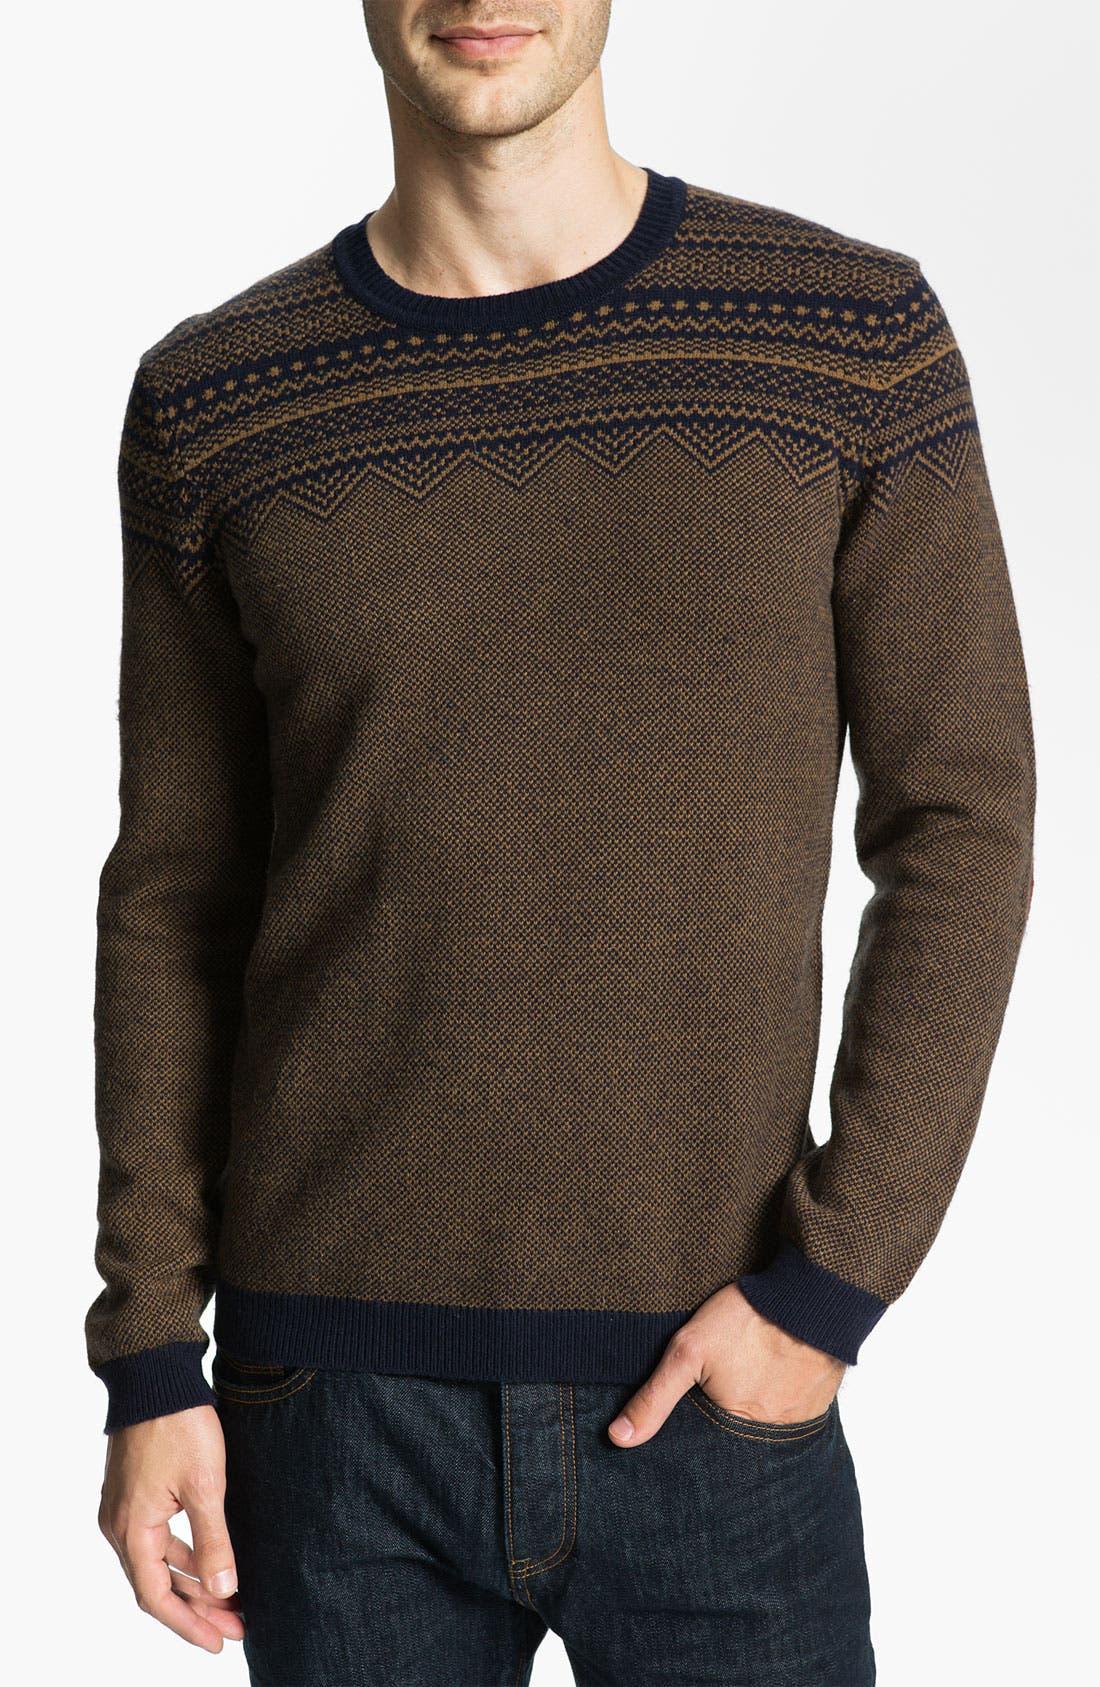 Alternate Image 1 Selected - Ted Baker London 'Micemen' Fair Isle Crewneck Sweater